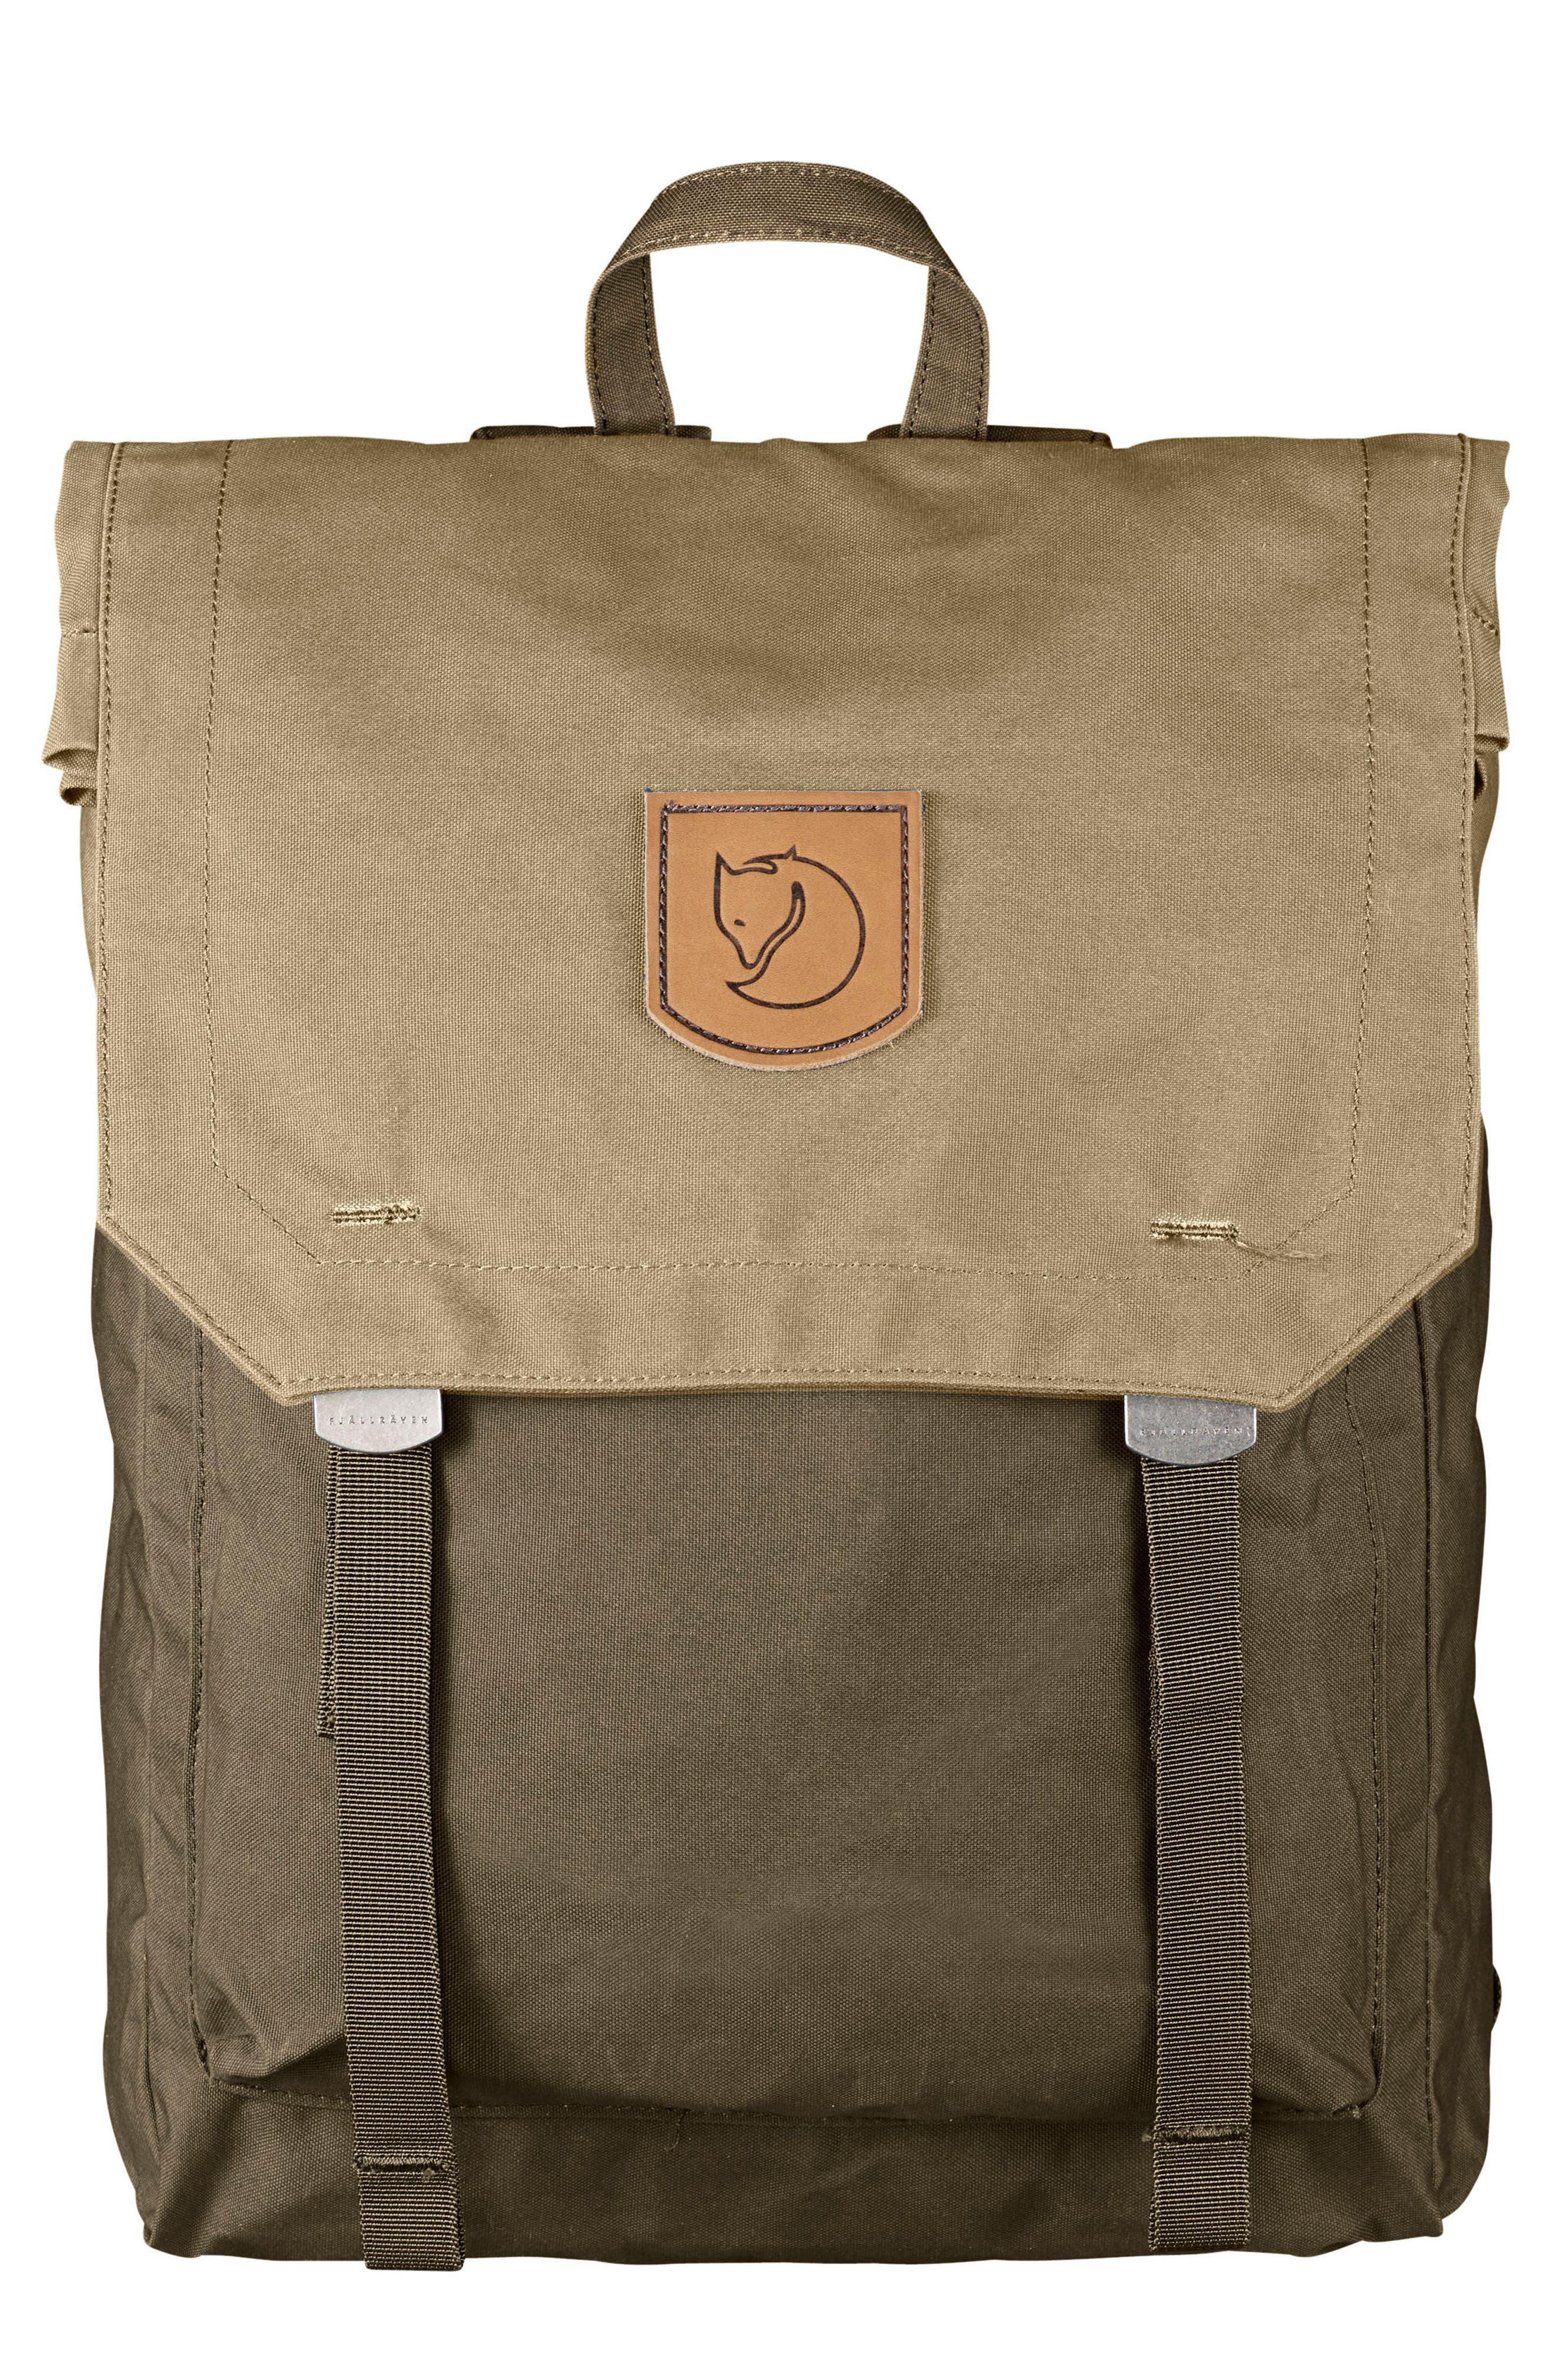 'Foldsack No. 1' Backpack,                             Main thumbnail 1, color,                             283